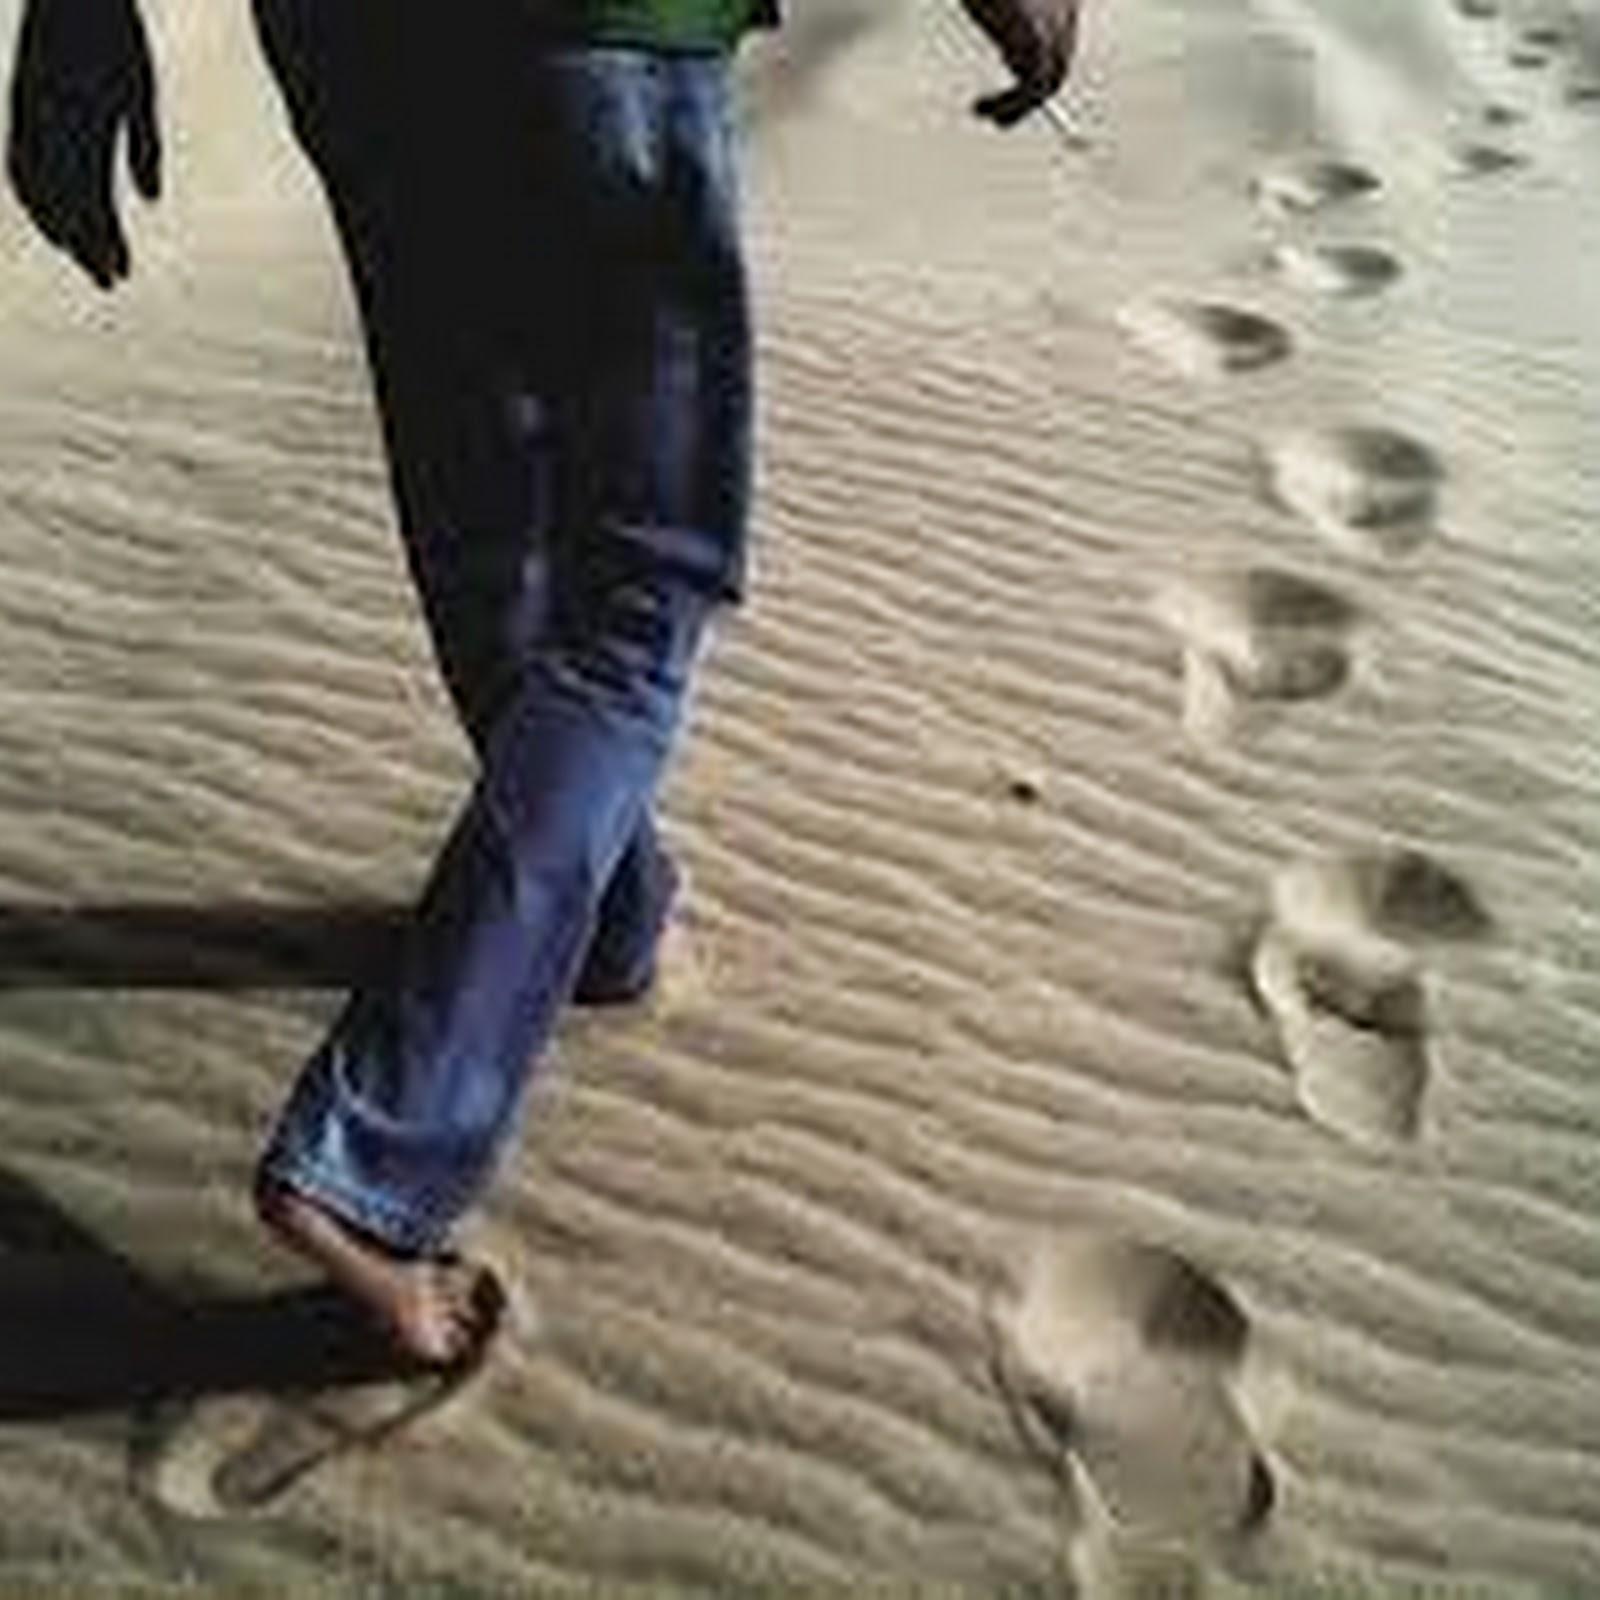 bf9378377 فوائد طبية للمشي حافي القدمين , وربما نعجب أن النبي صلى الله عليه وسلم كان  أول من أوصانا بذلك .ما الفرق بين المشي حافي القدمين أم ان تلبس حذاء !